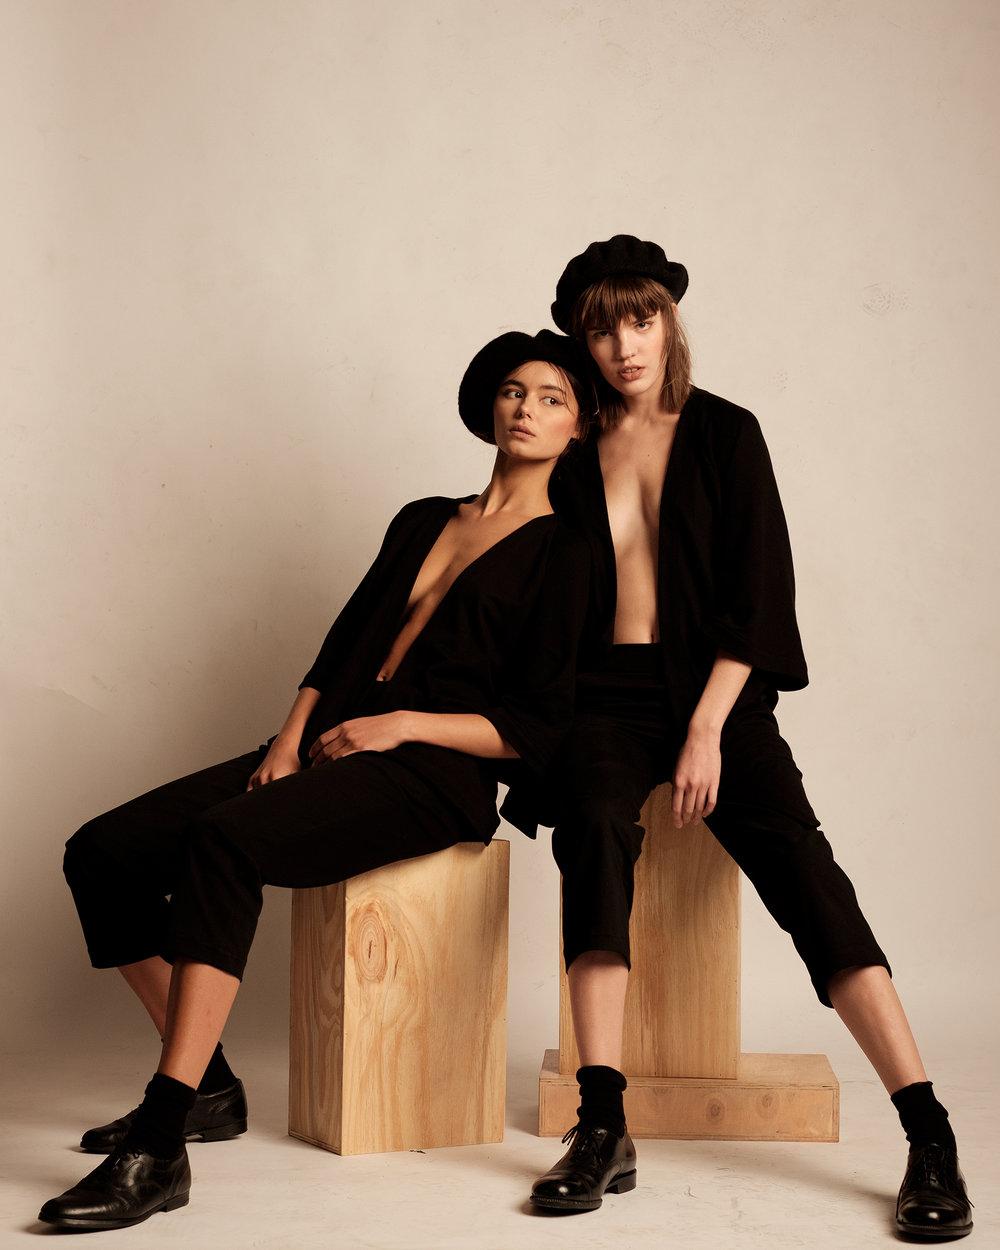 Photo: Oliver Moosus / Models:Getter Killing / Alisa Grabovaja /Bianka Haavel